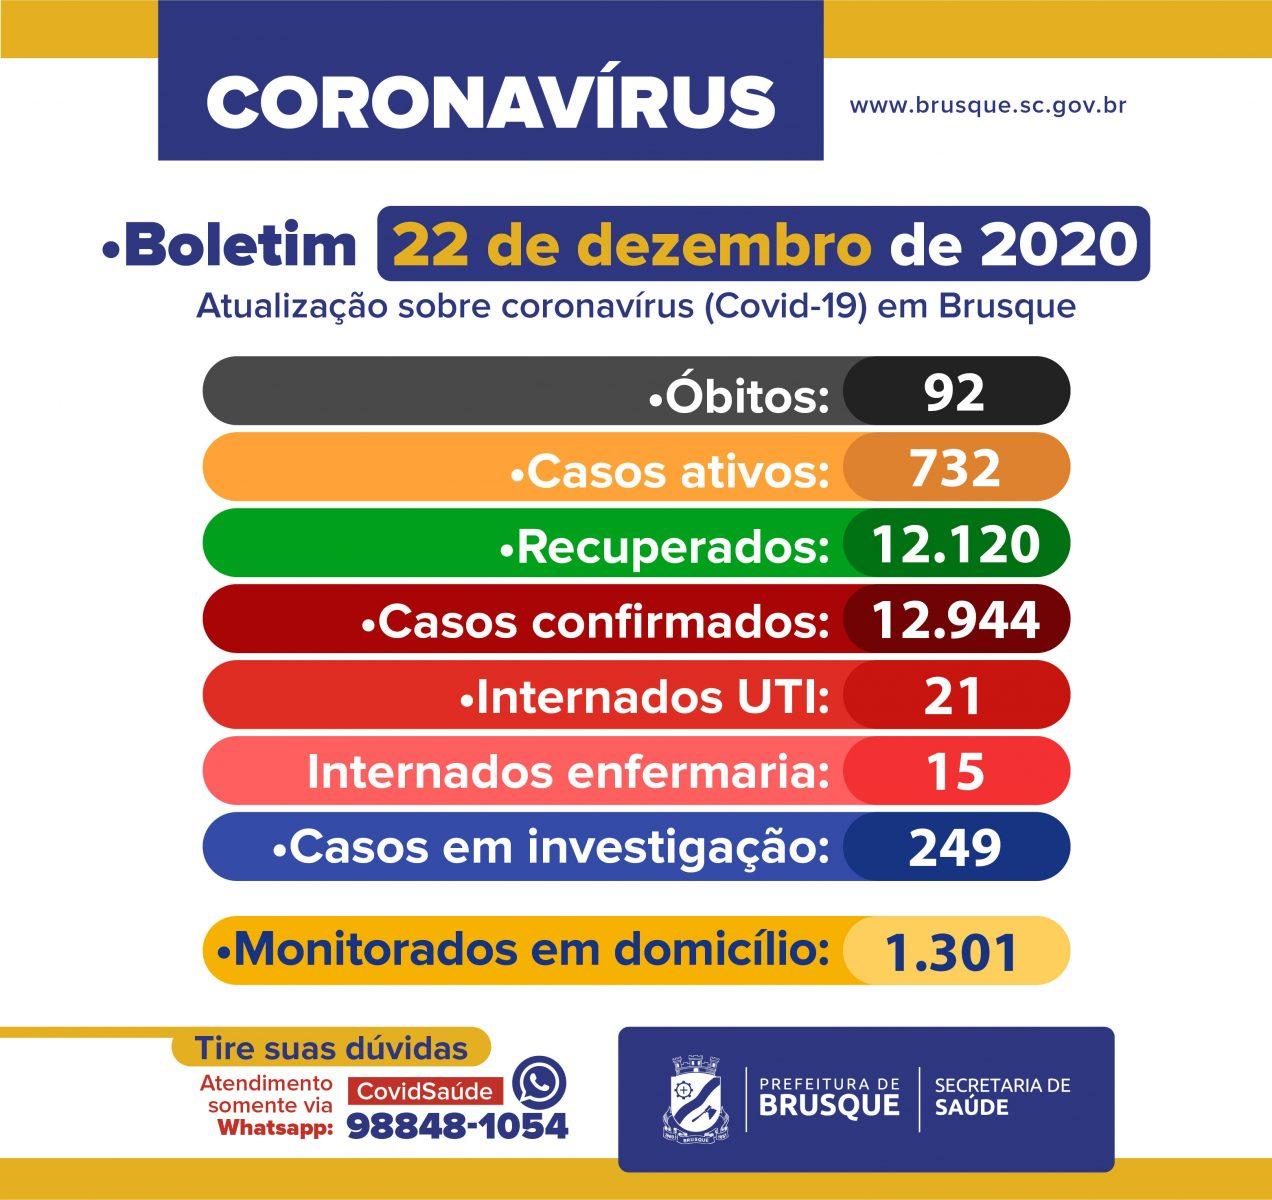 Brusque registra 3 óbitos relacionados ao coronavírus